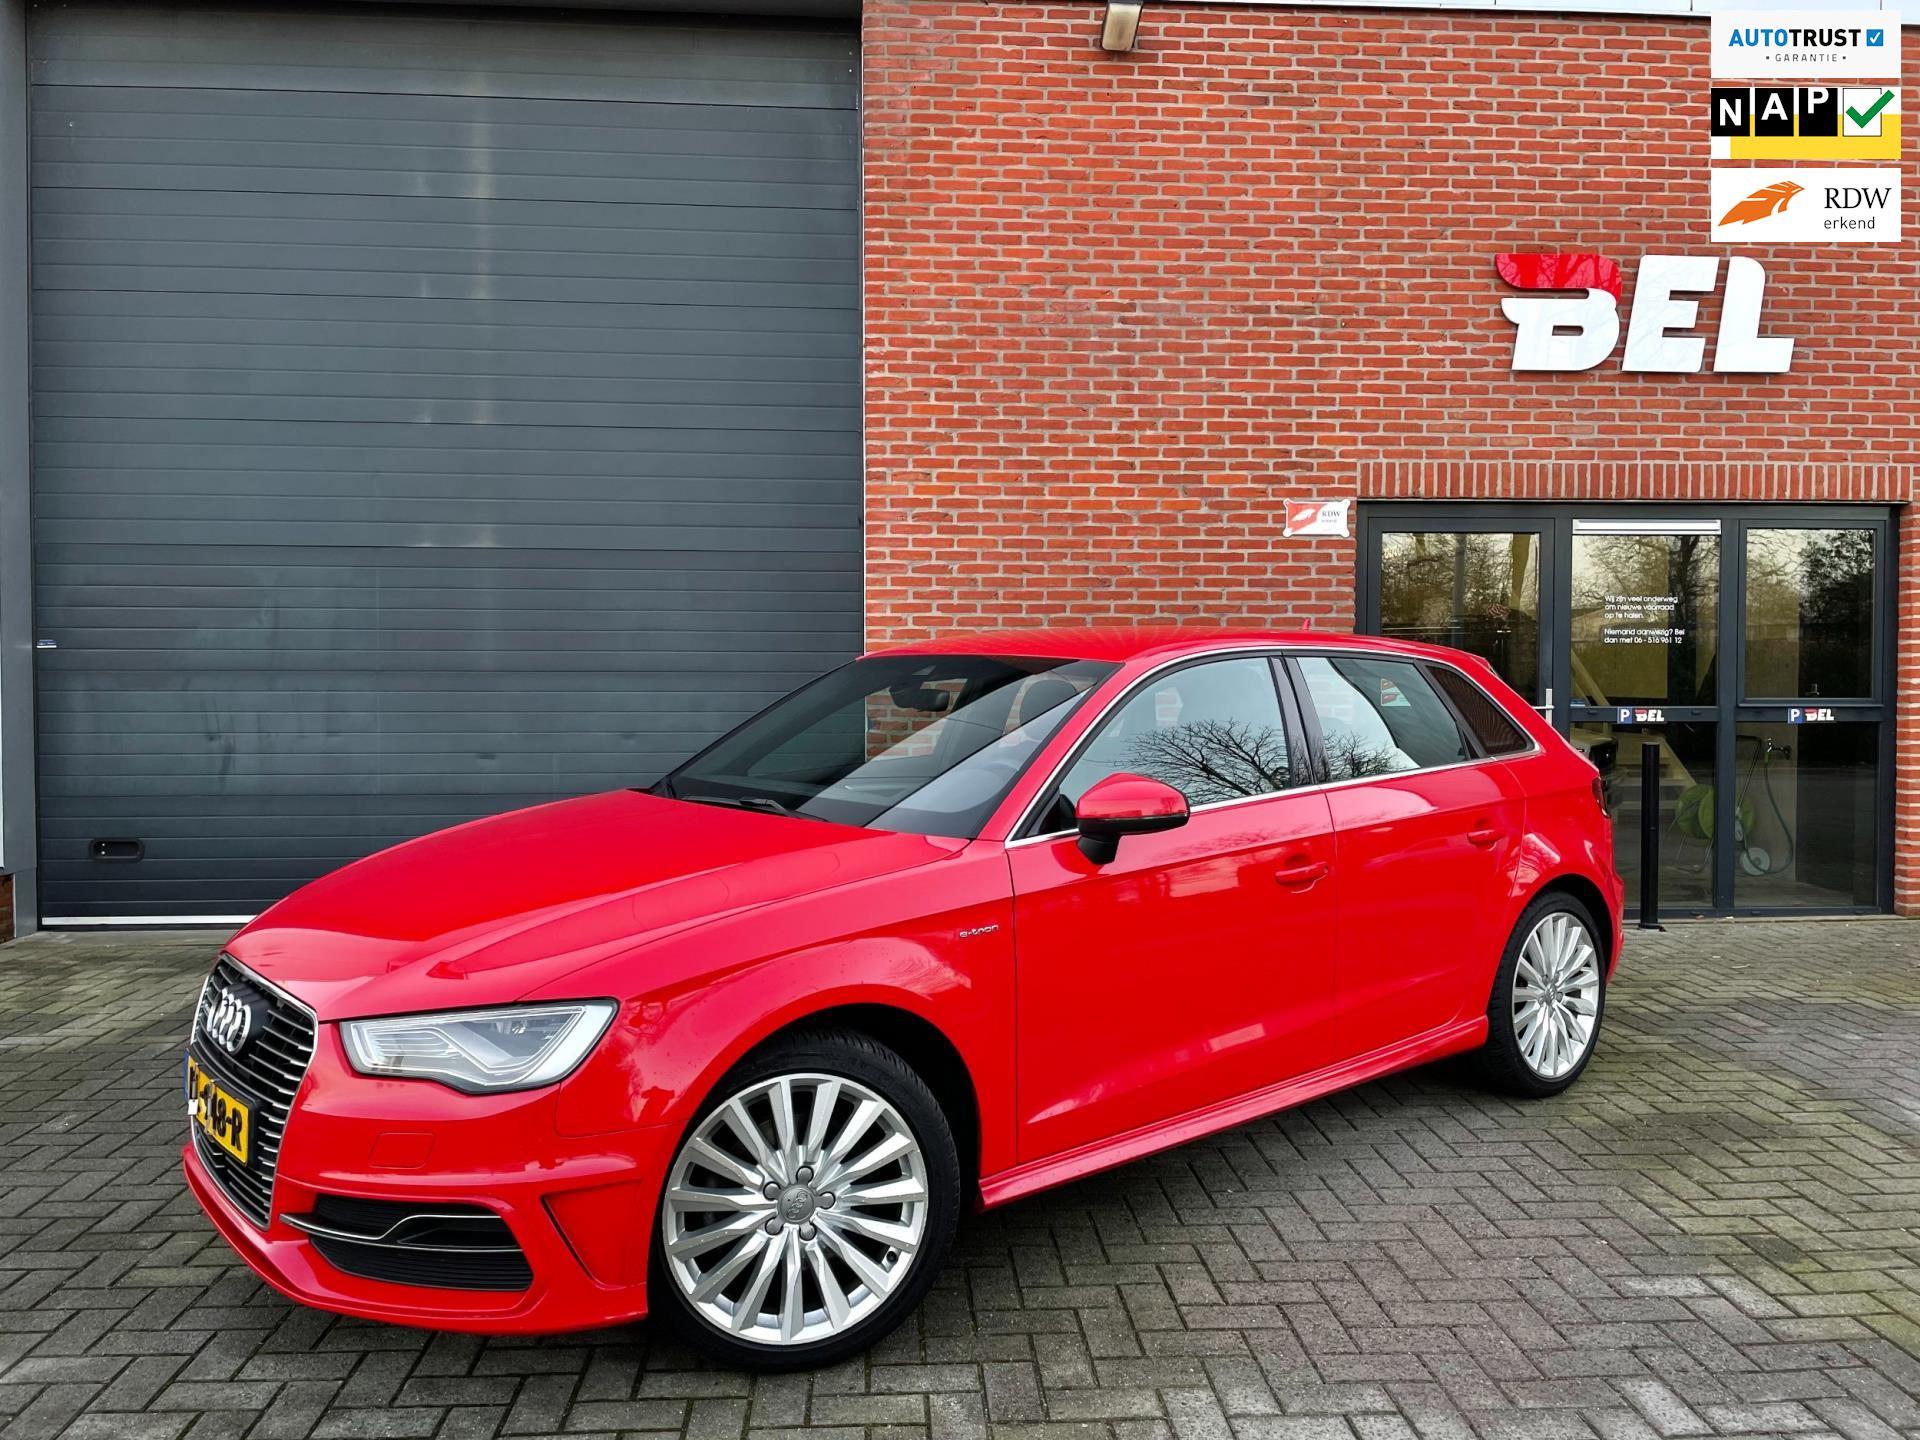 Audi A3 Sportback occasion - Bel Auto's